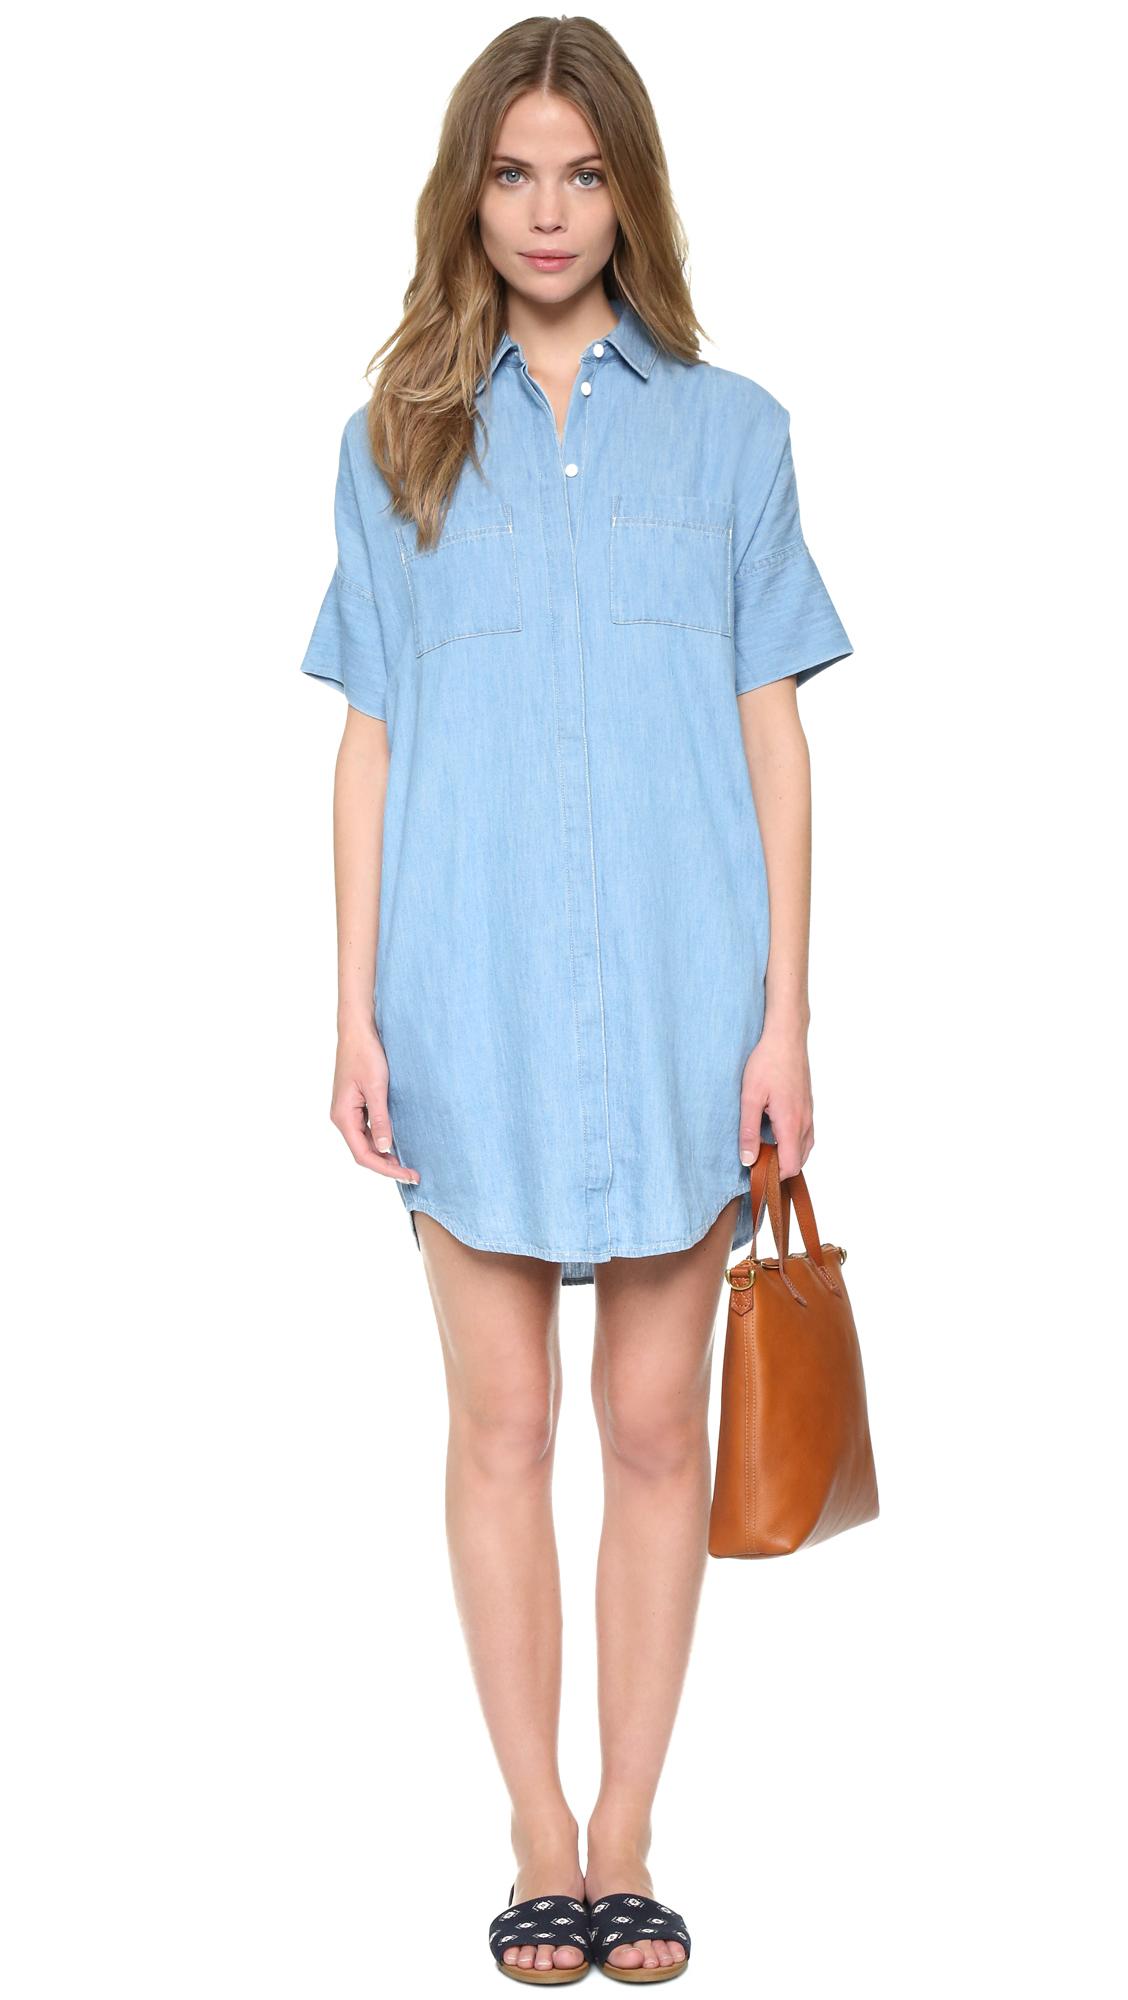 Madewell Courier Denim Dress in Blue